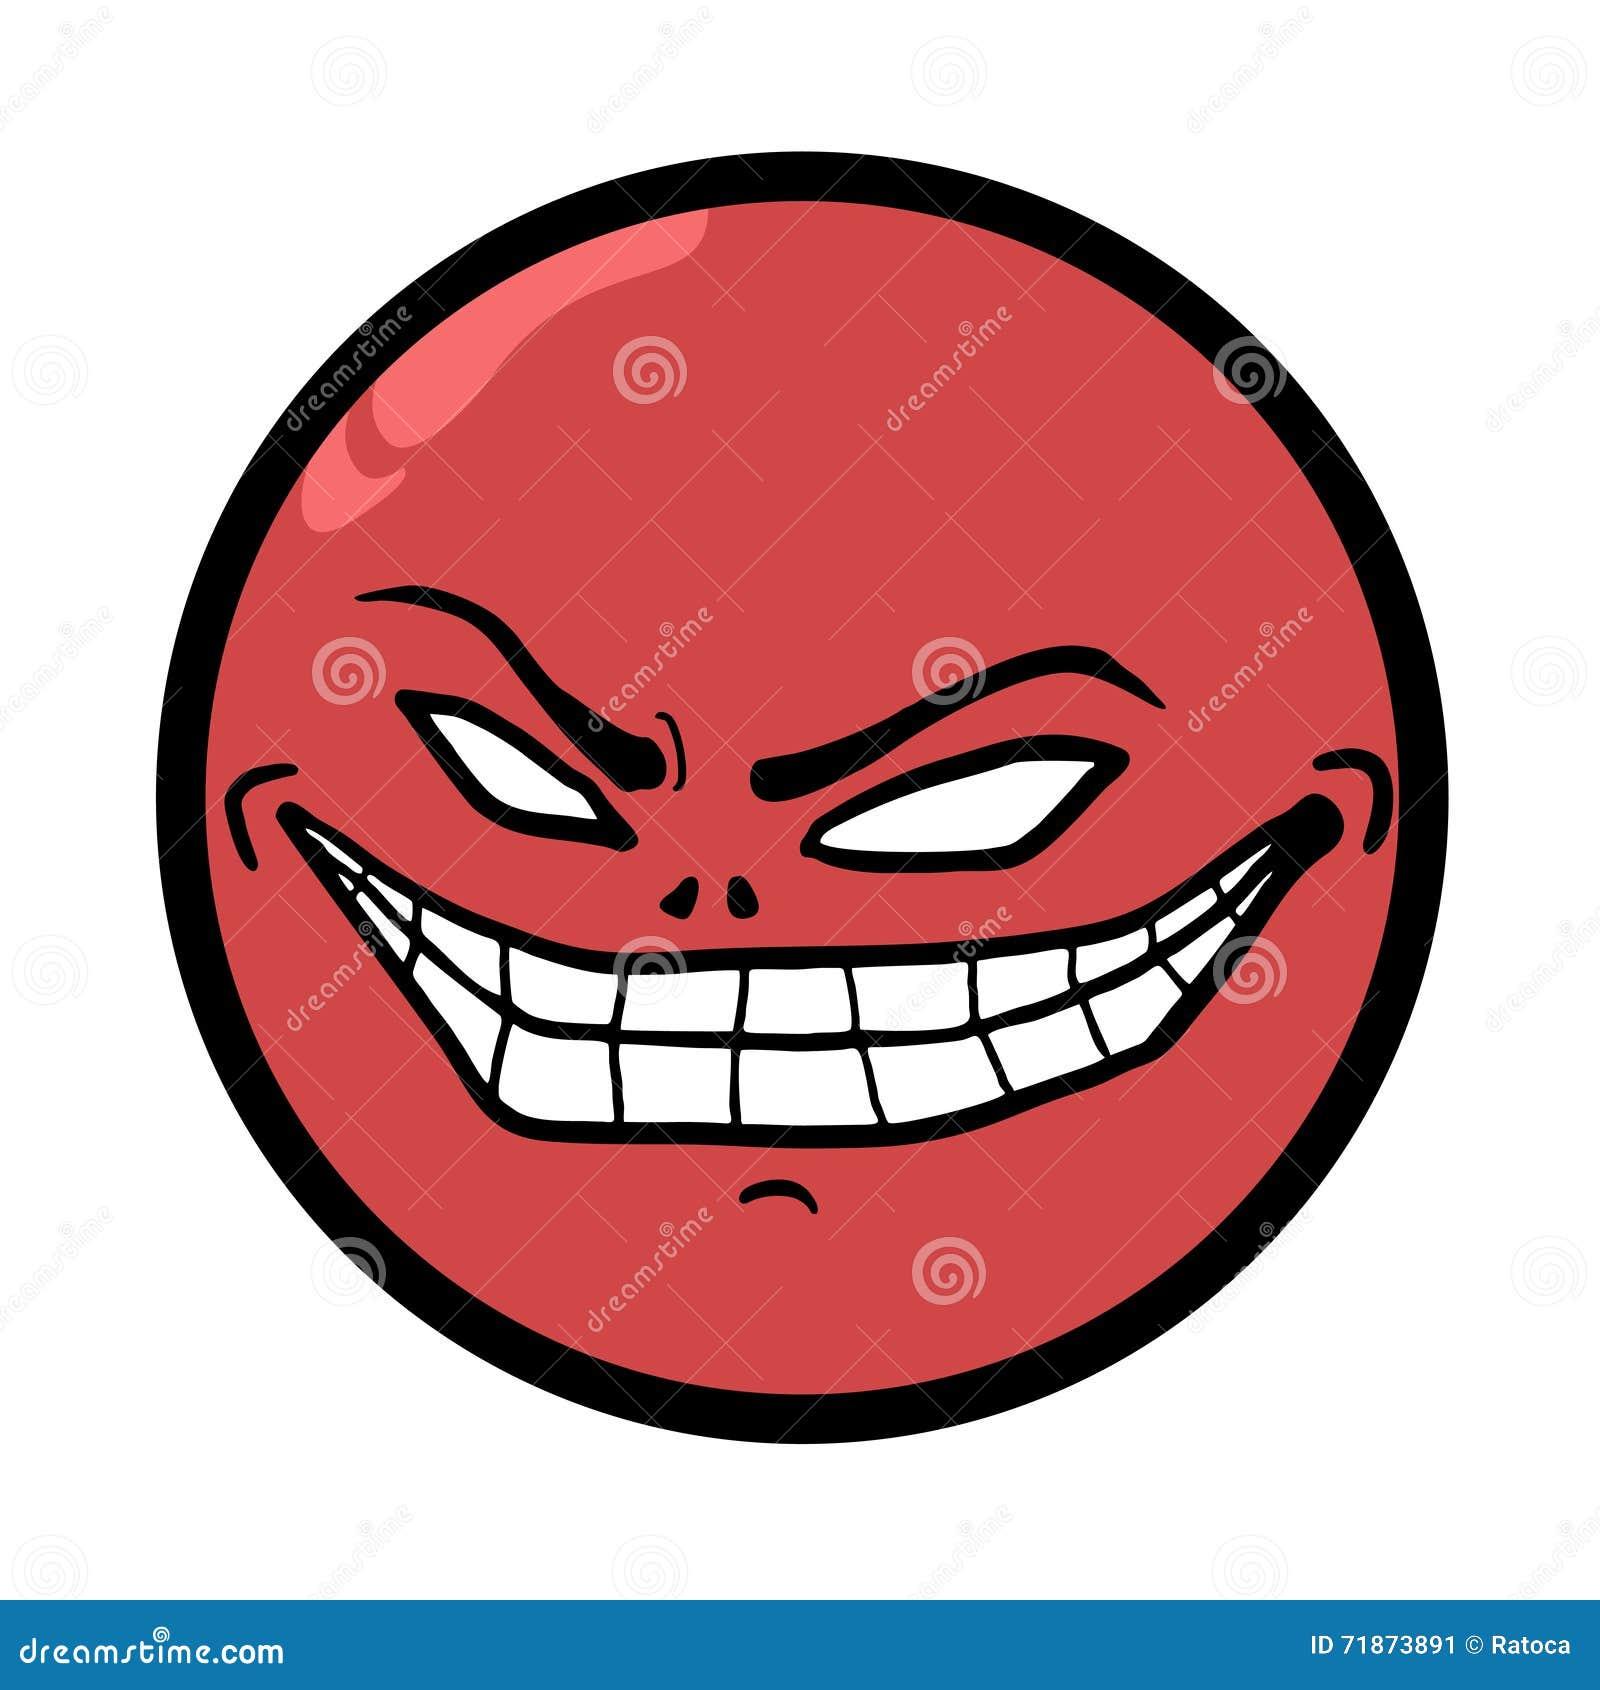 smile crazy face stock vector illustration of monster 71873891